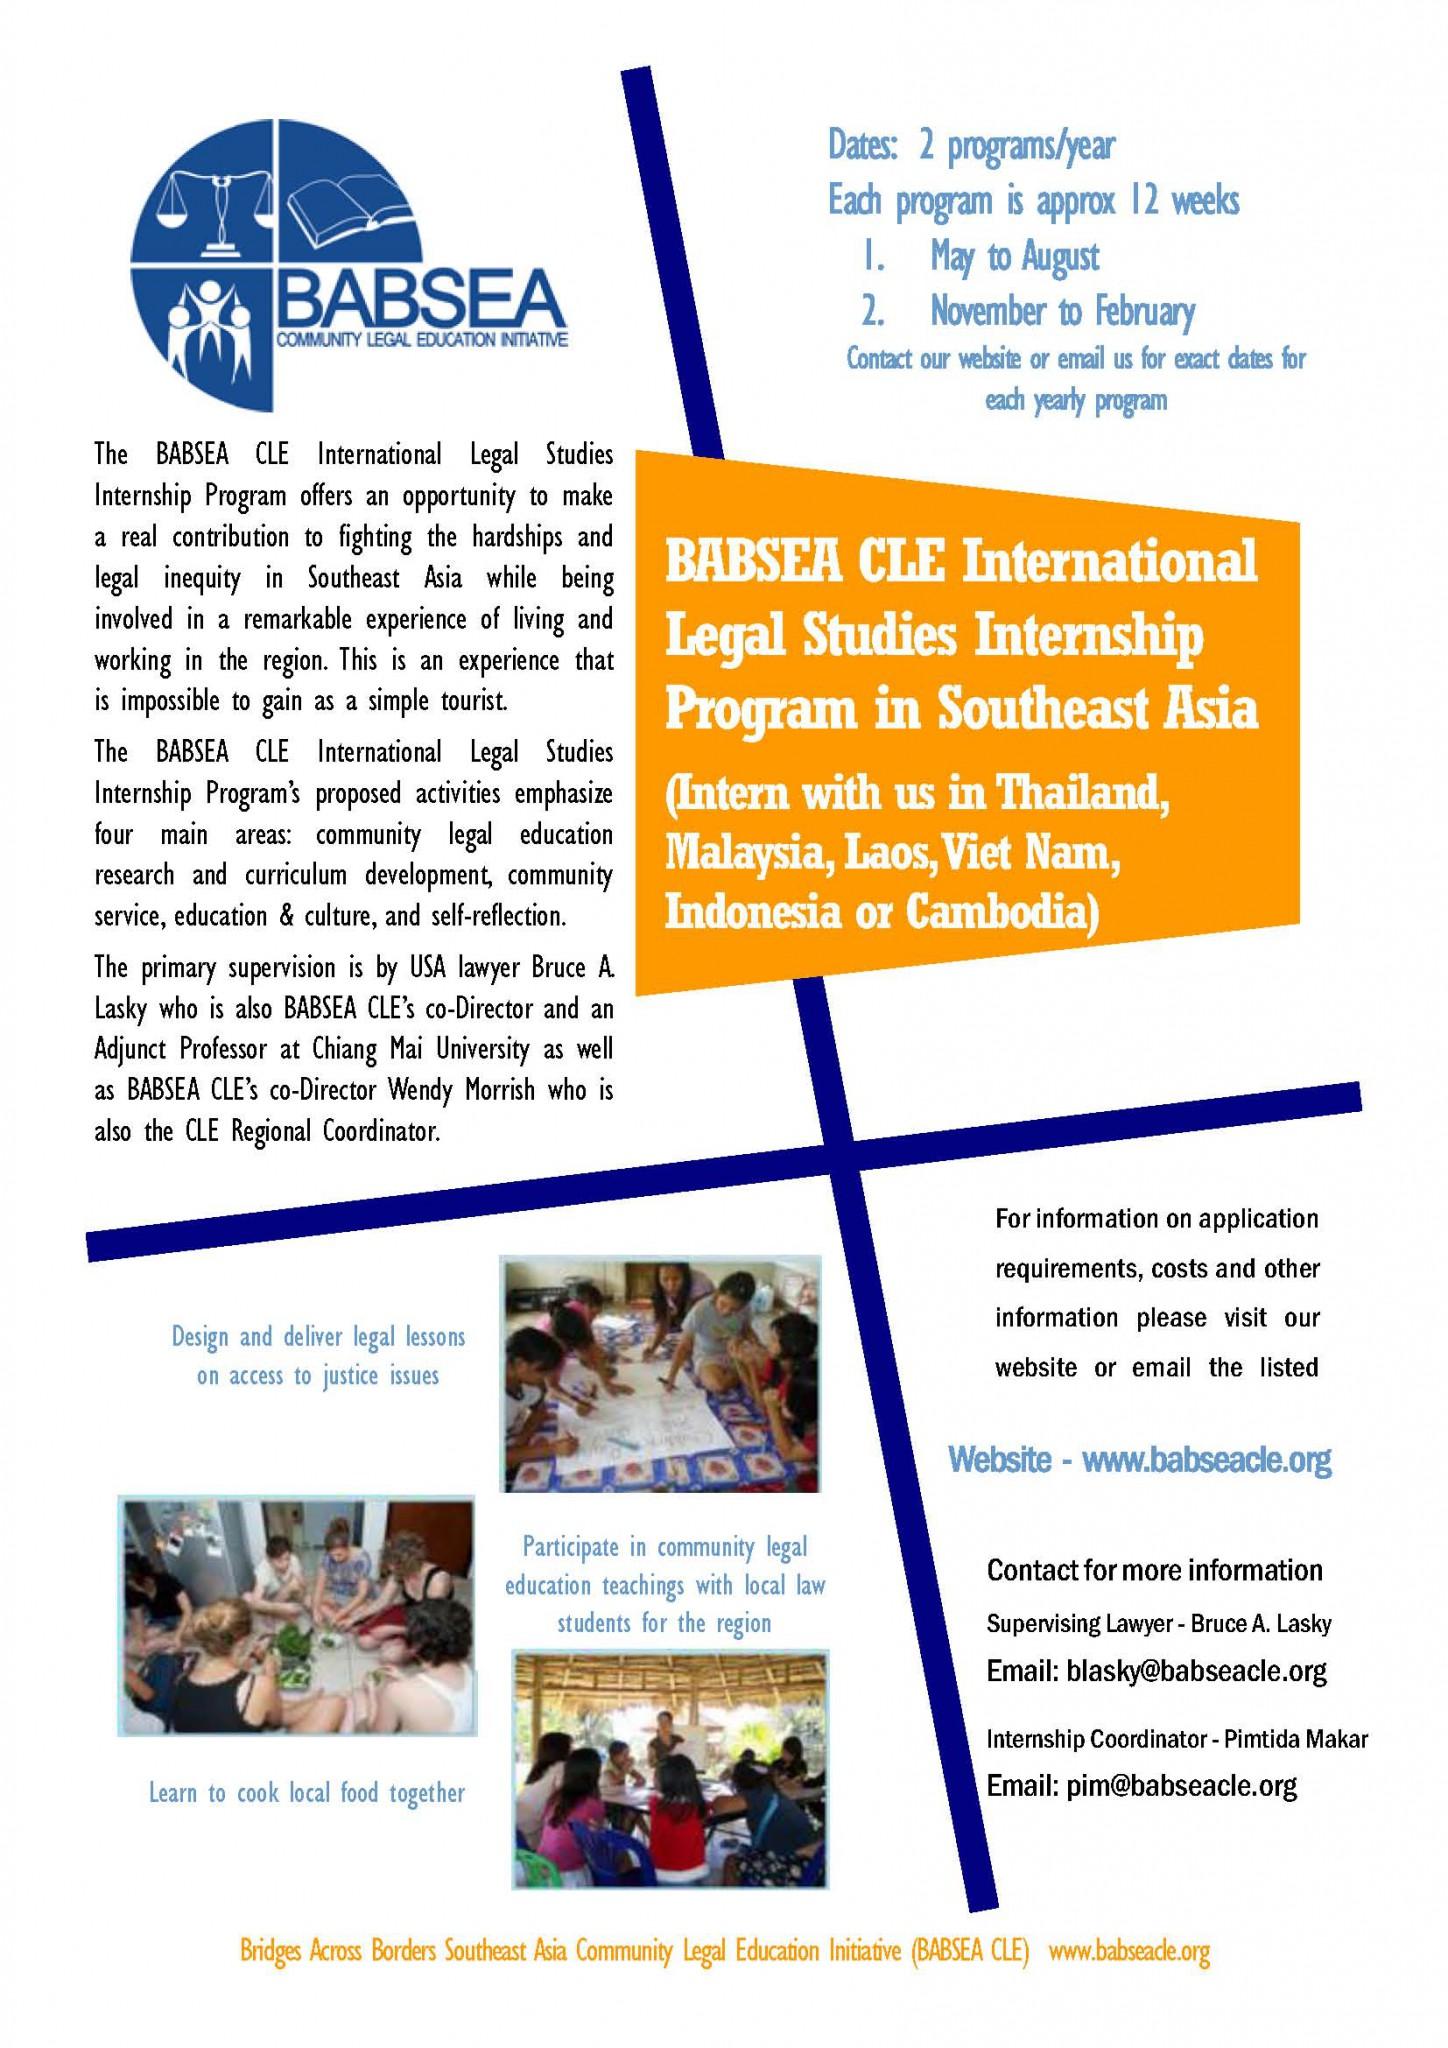 BABSEA CLE Legal Studies International Externship Flyer